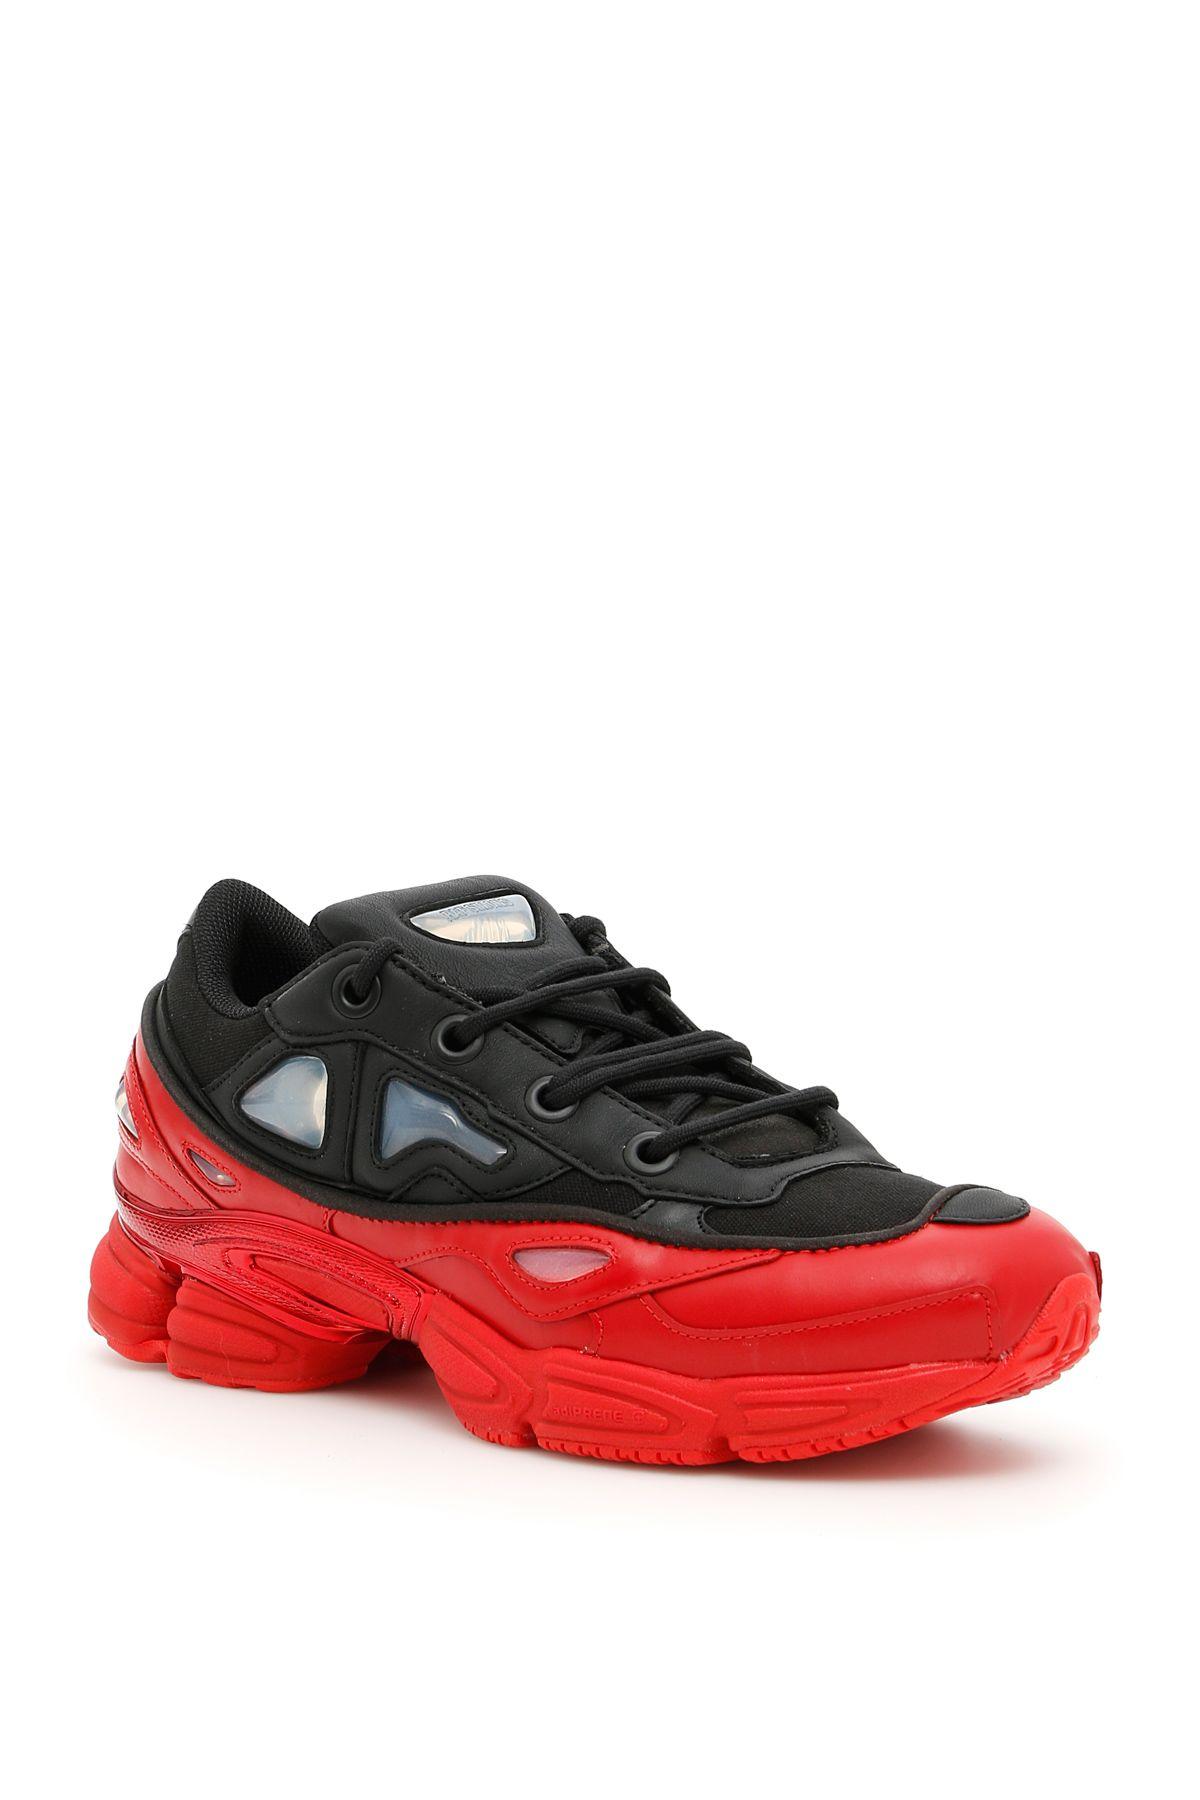 adidas by raf simons ozweego iii raf simons sneakers. Black Bedroom Furniture Sets. Home Design Ideas